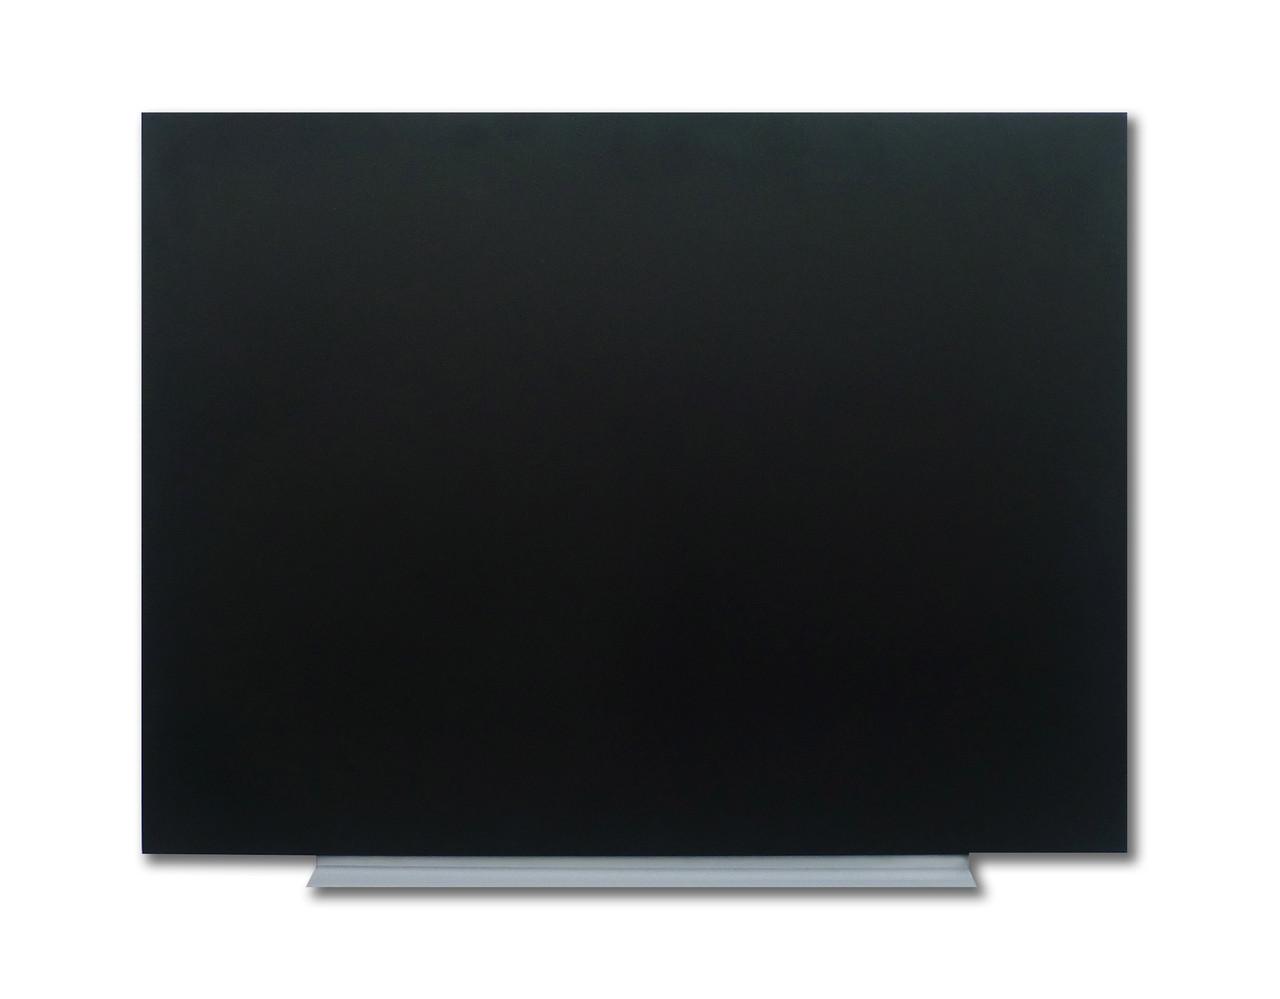 Доска меловая магнитная тонкая 100х150 безрамная Tetris. Крейдяна грифельна магнітна дошка